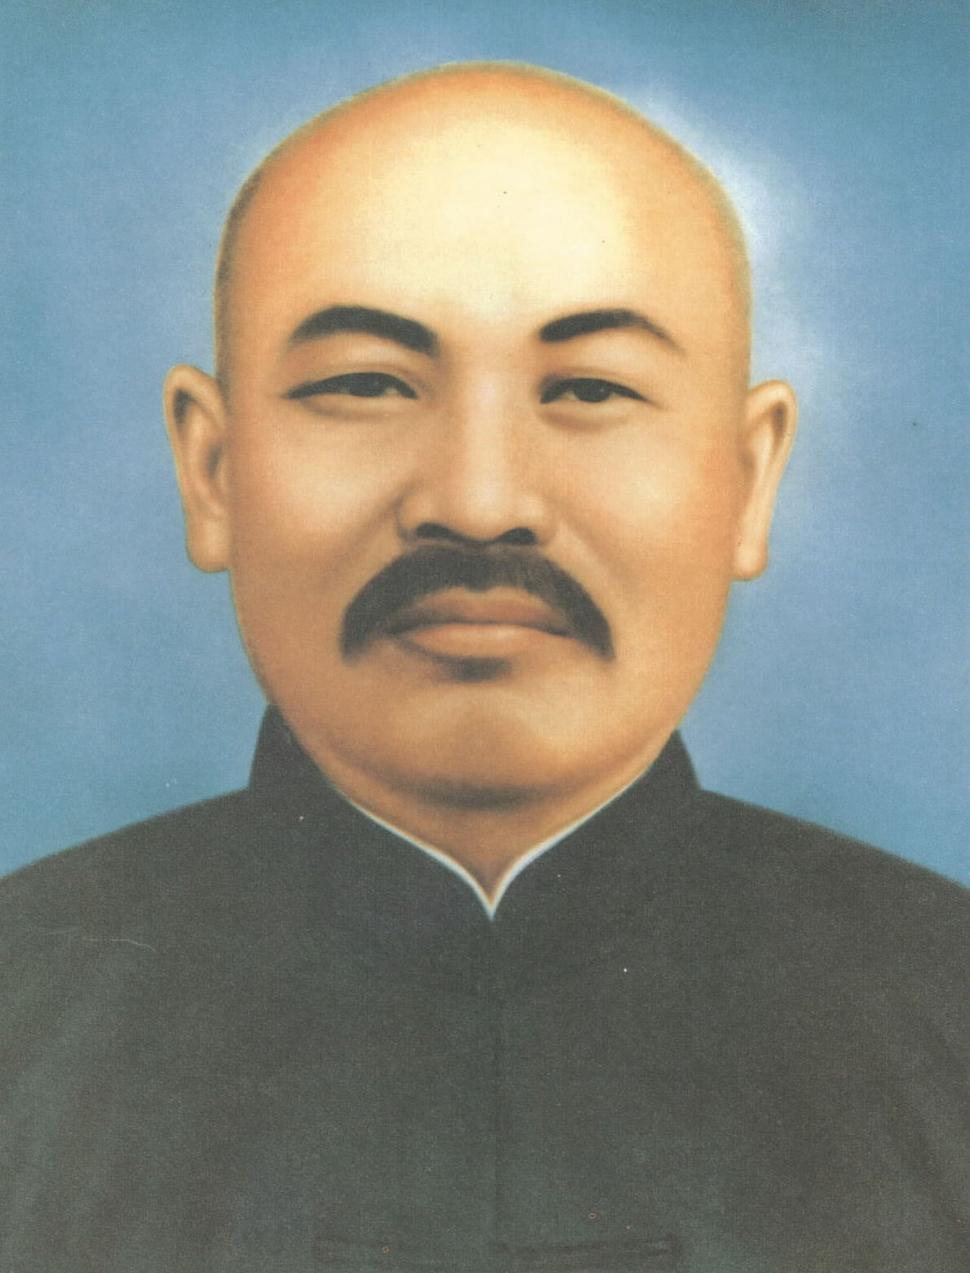 Zhang Tianran